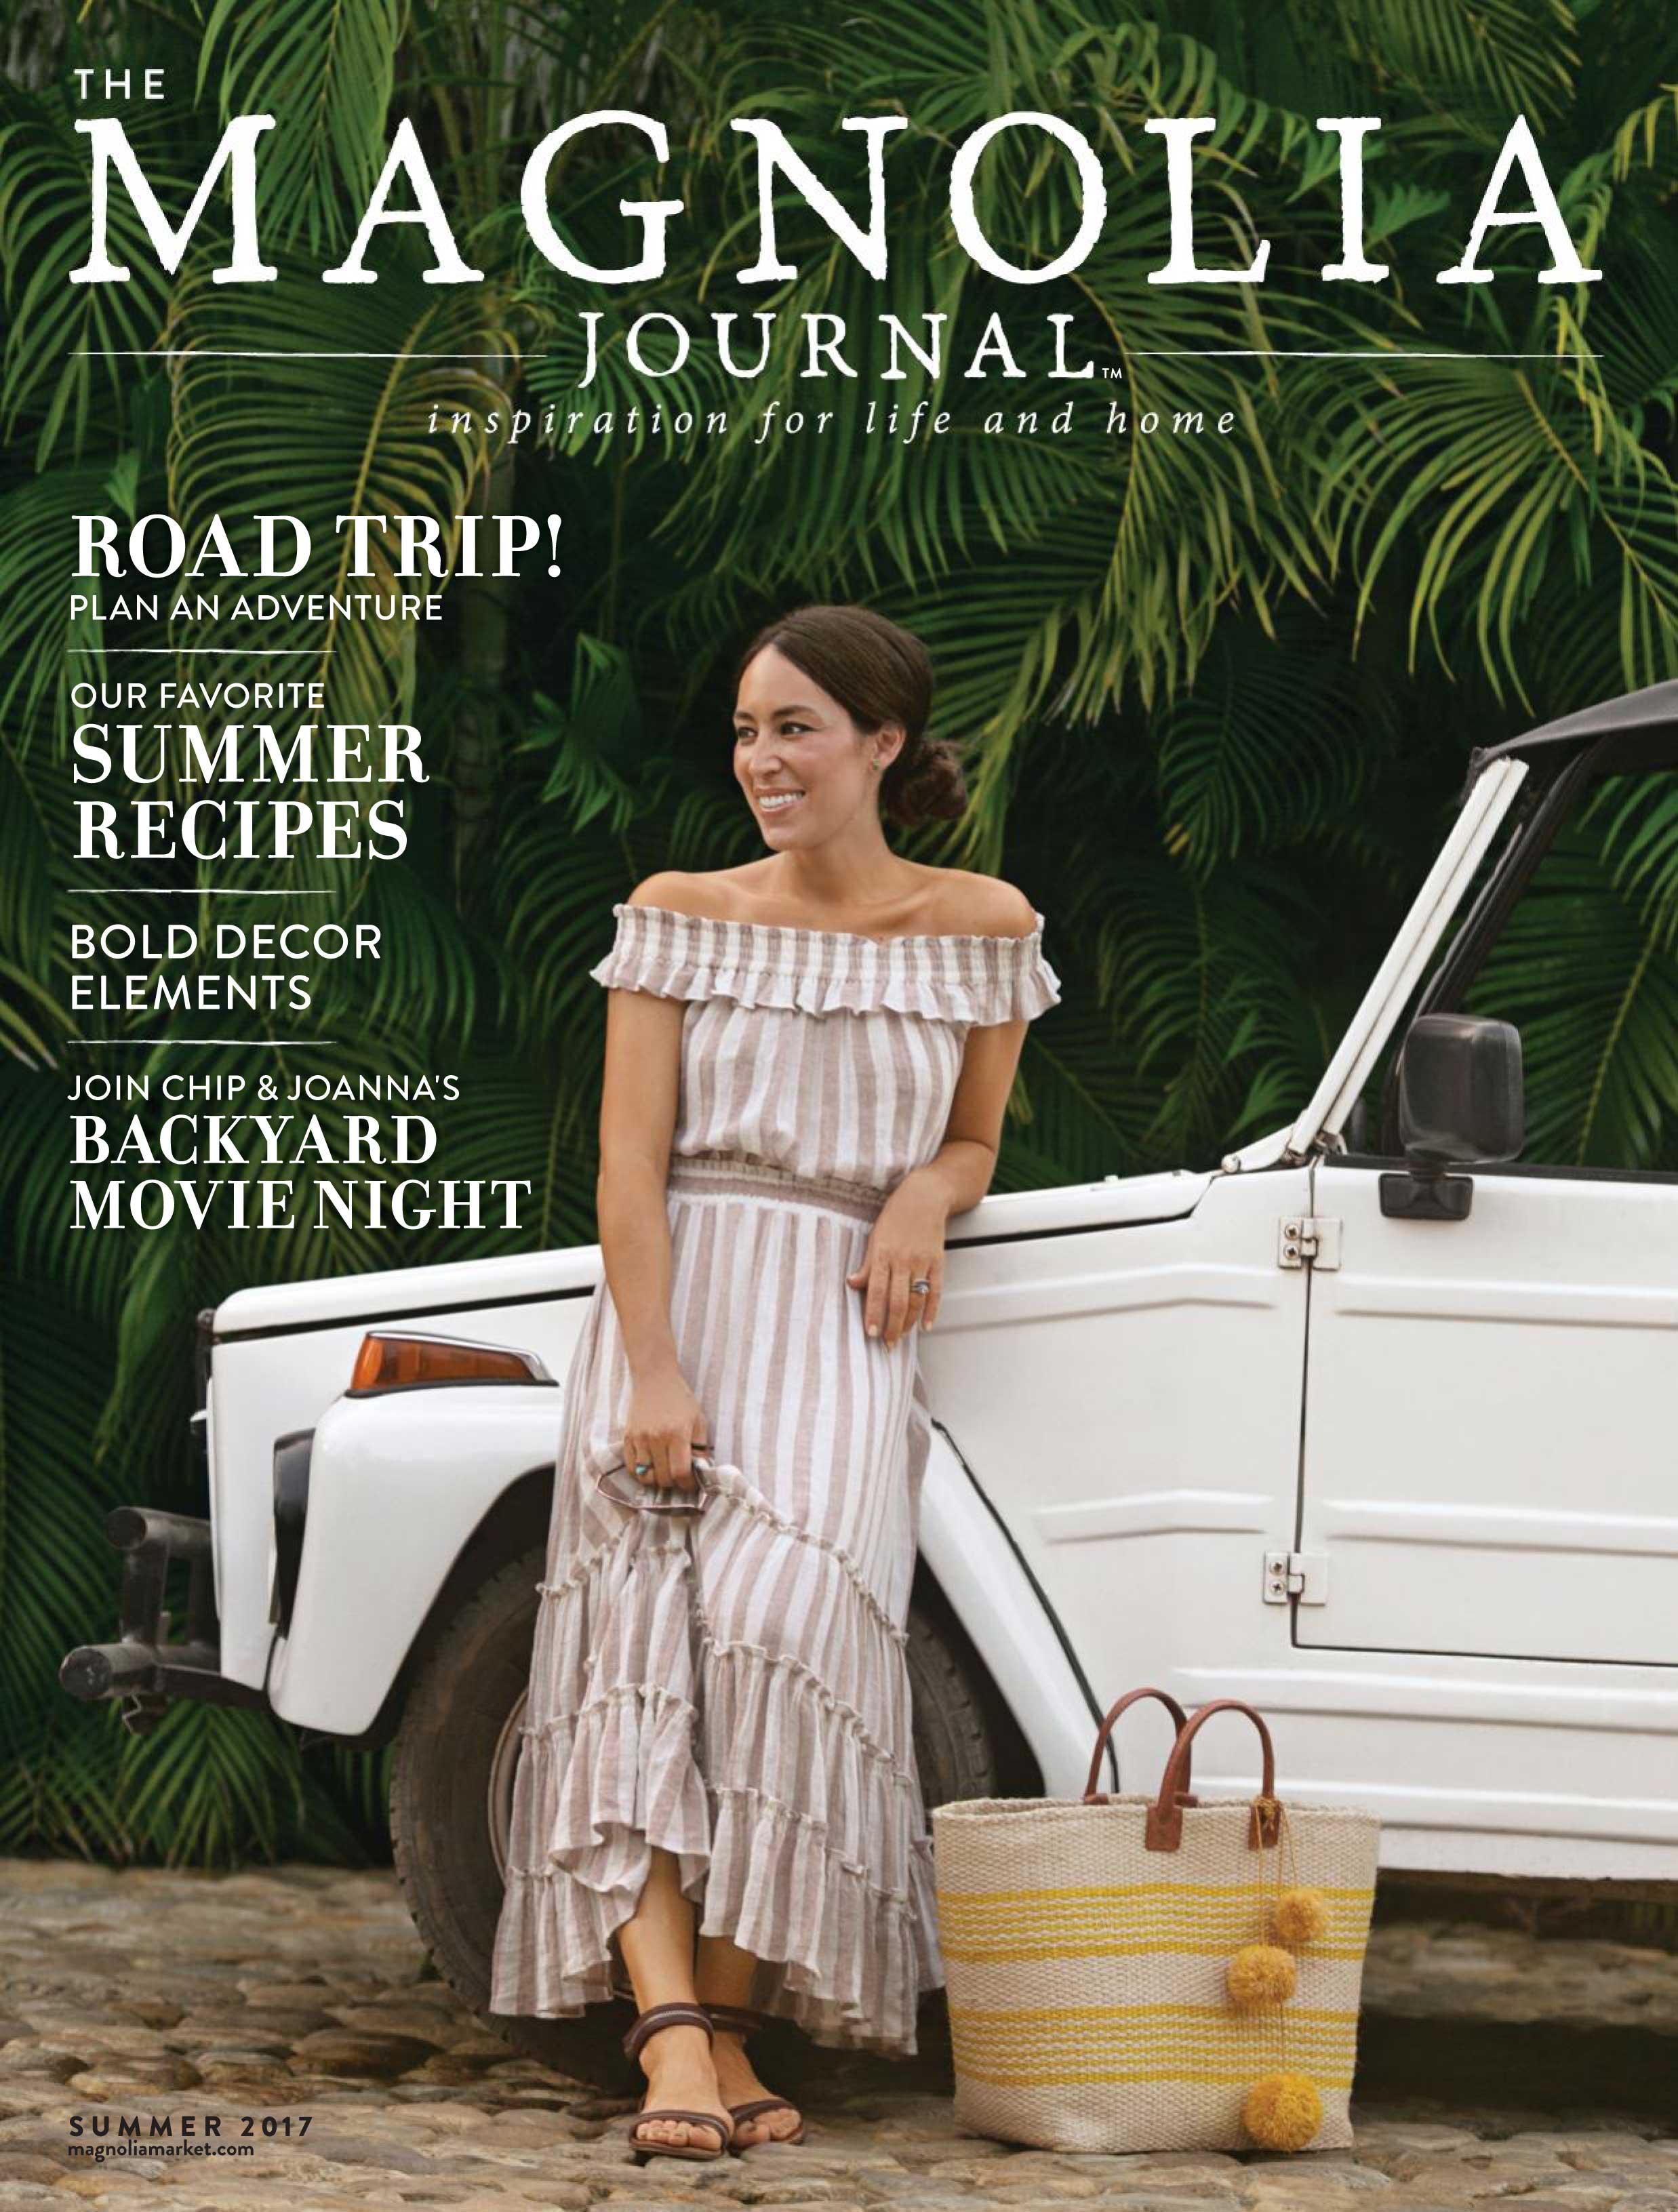 The_Magnolia_Journal__Summer_2017-1.jpg